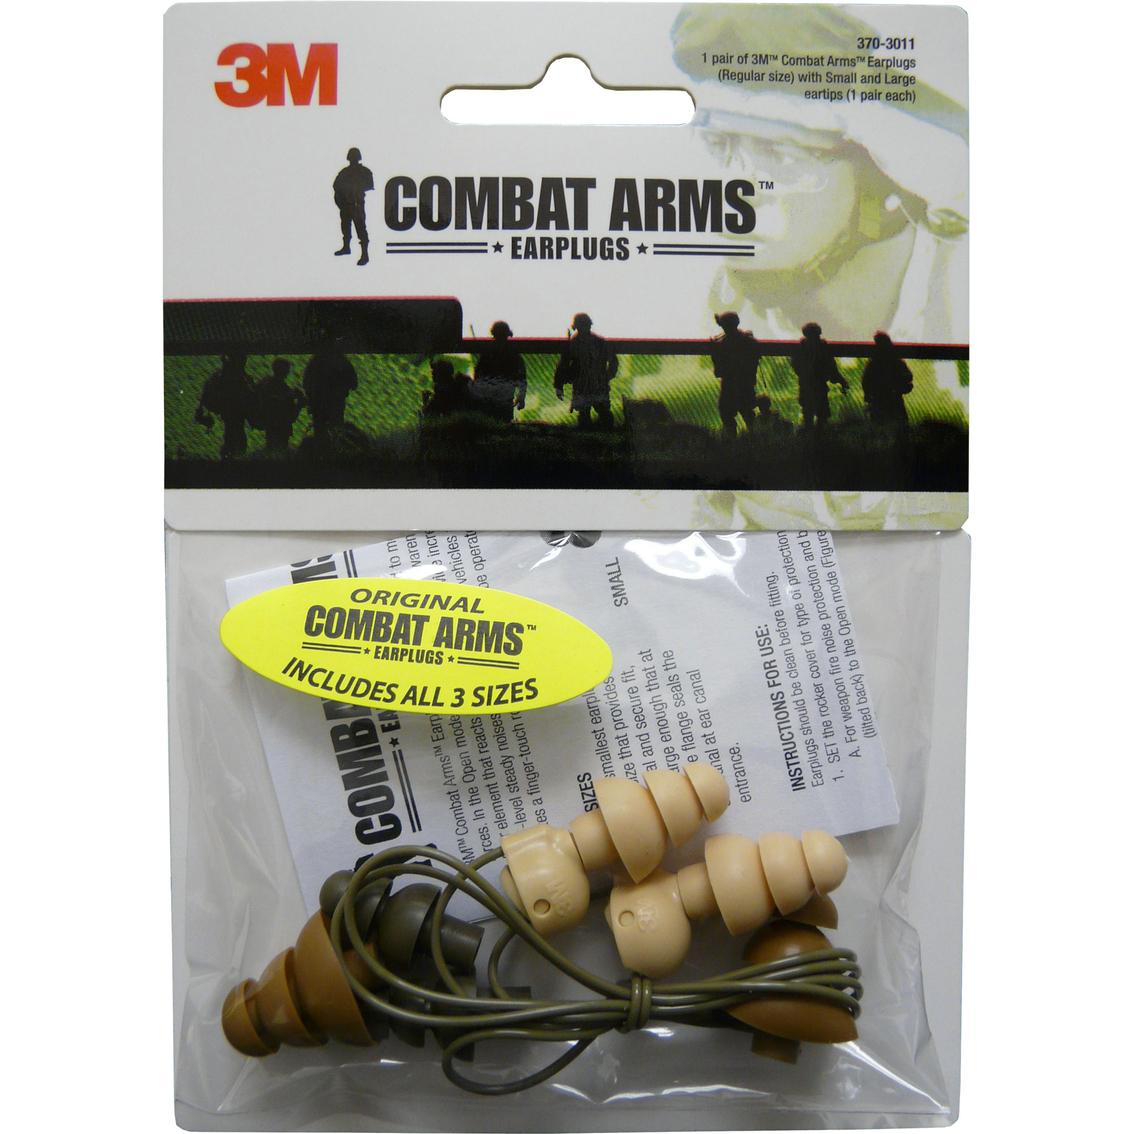 Combat Arms Earplugs Gun Accessories Military